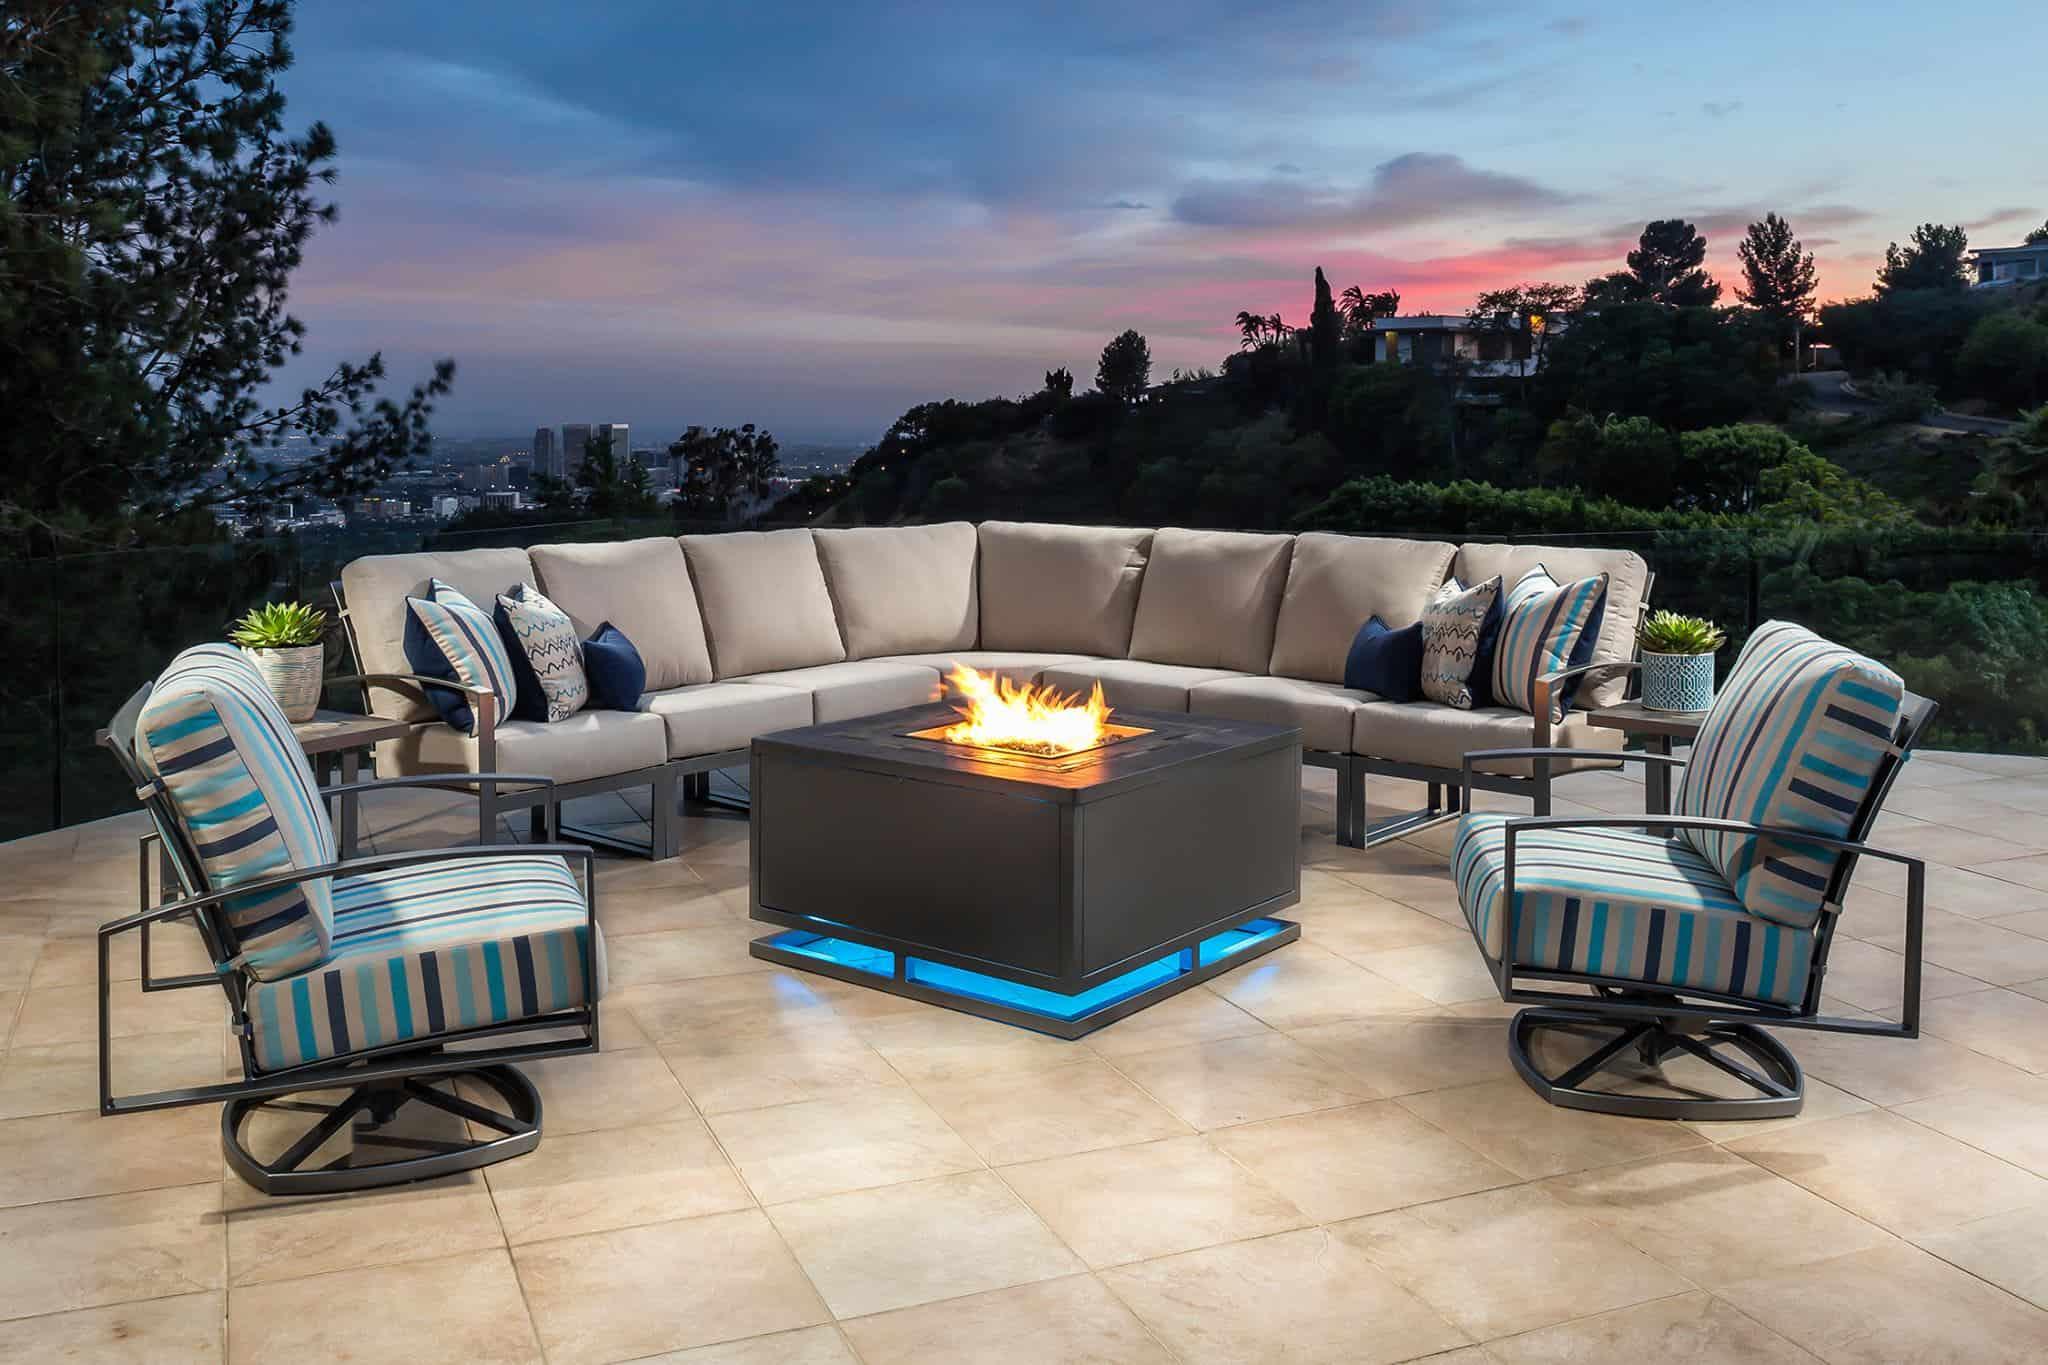 Exterior Design Blog Patio Furniture Blog Outdoor